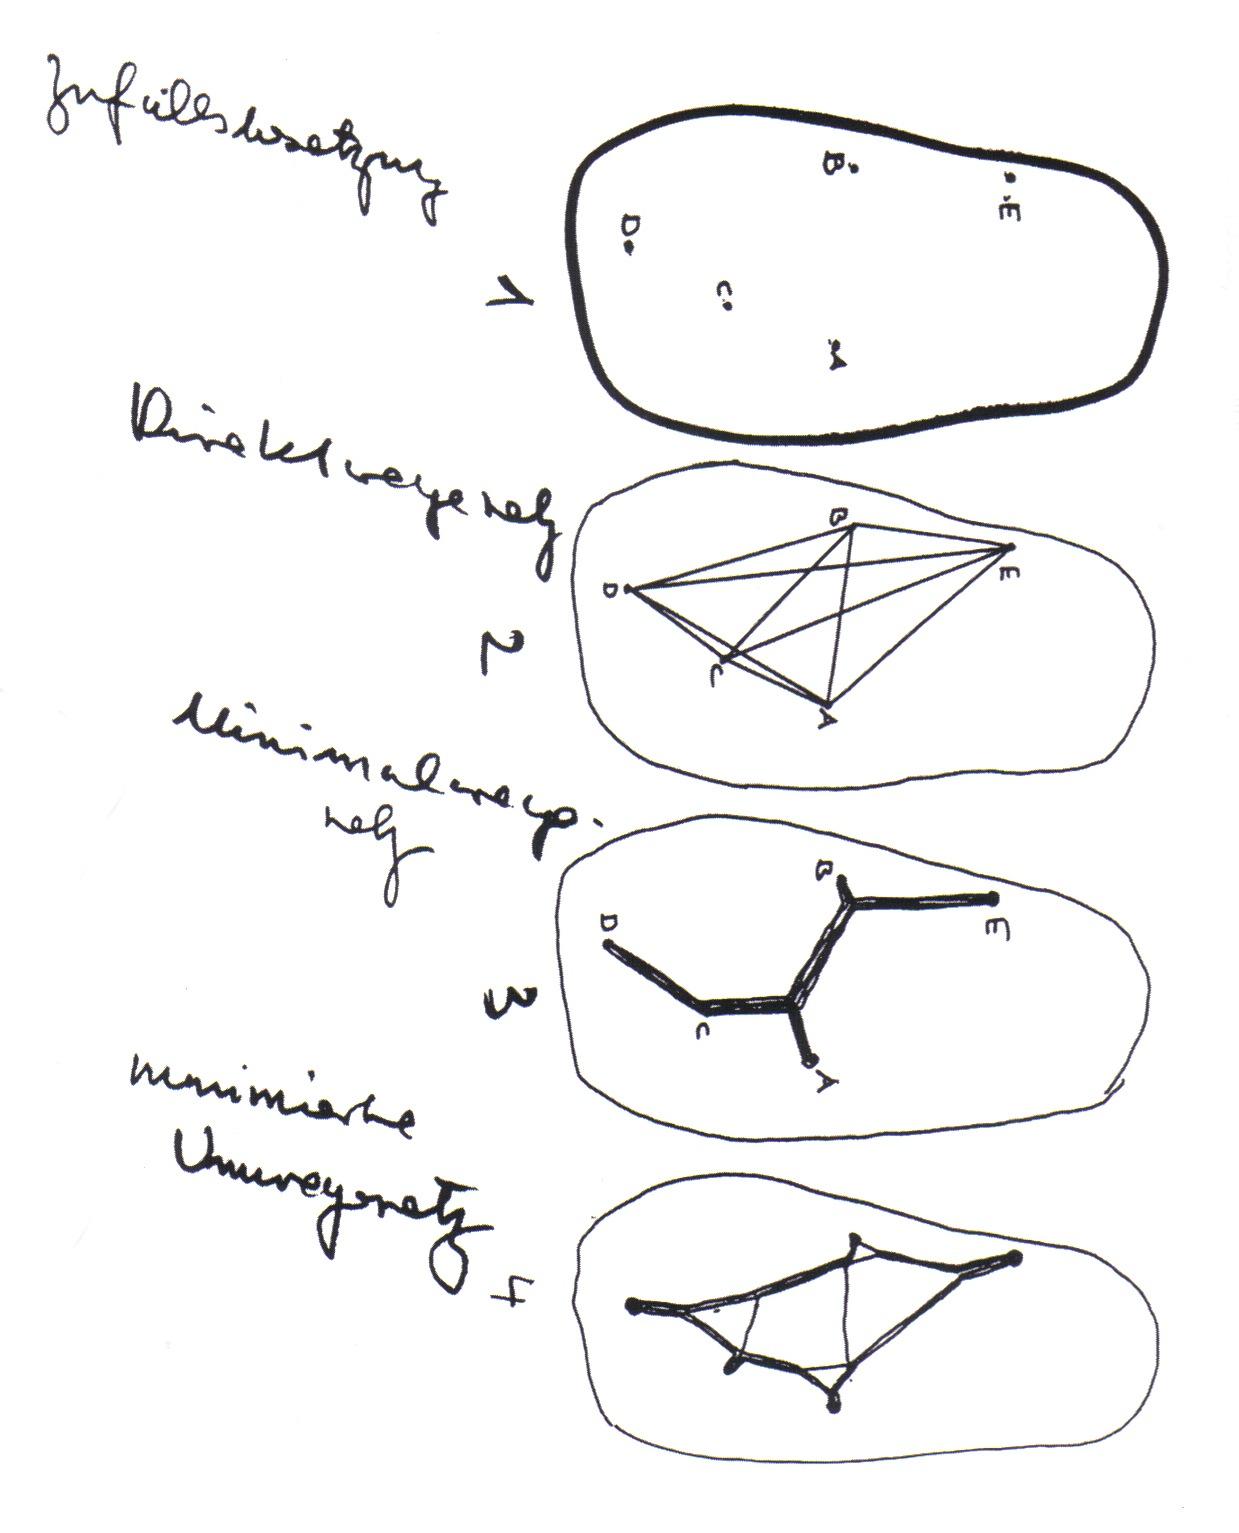 path-networks.jpg